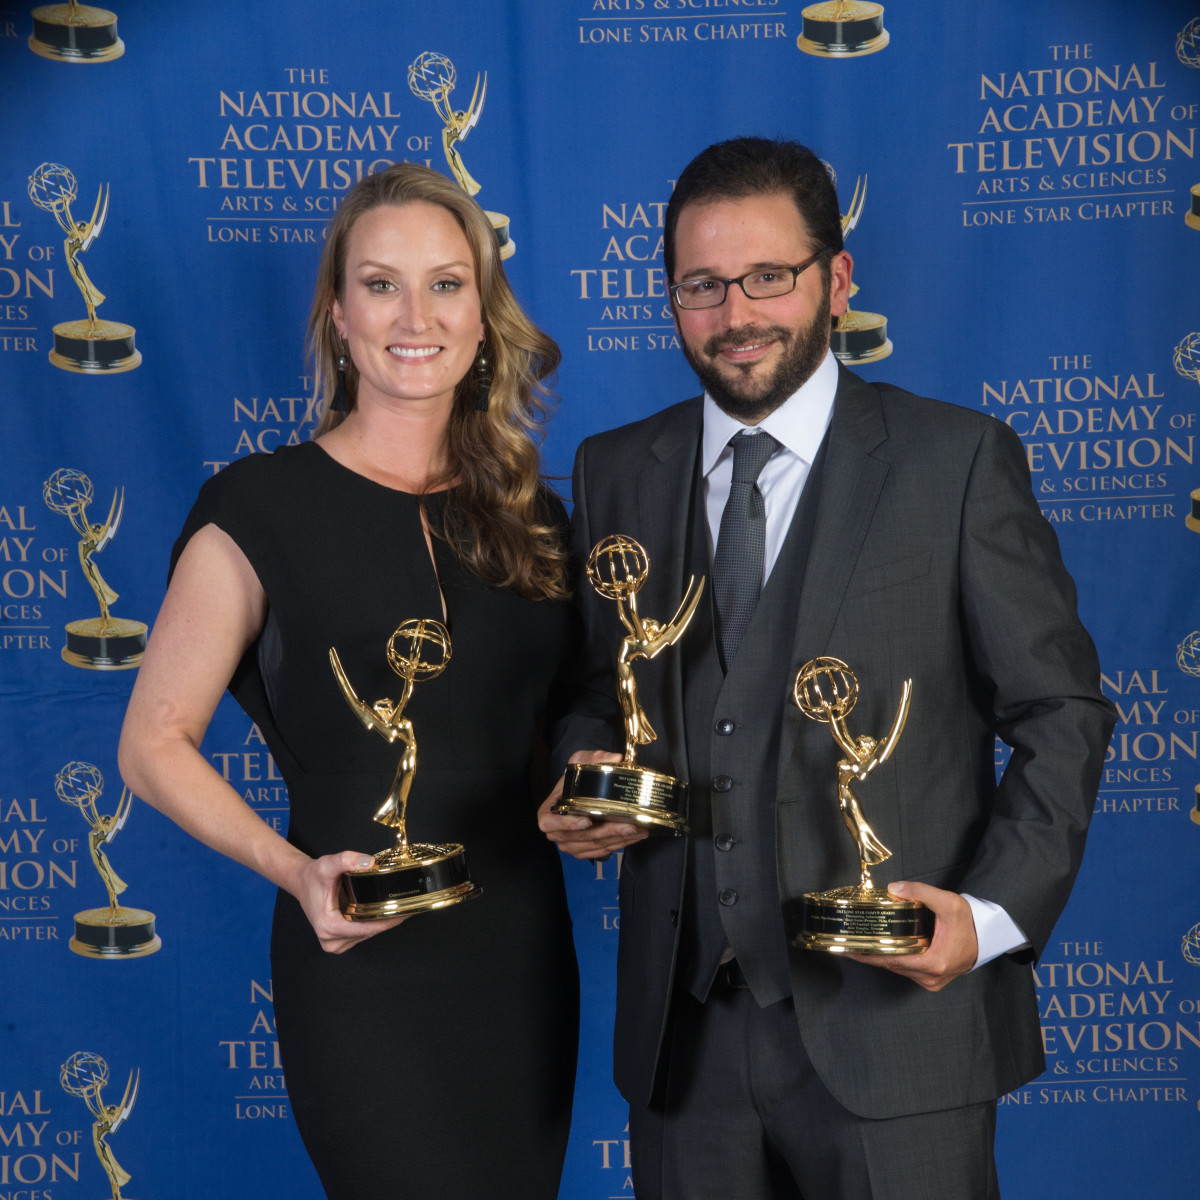 Whitney and Alex Douglas University of Houston film